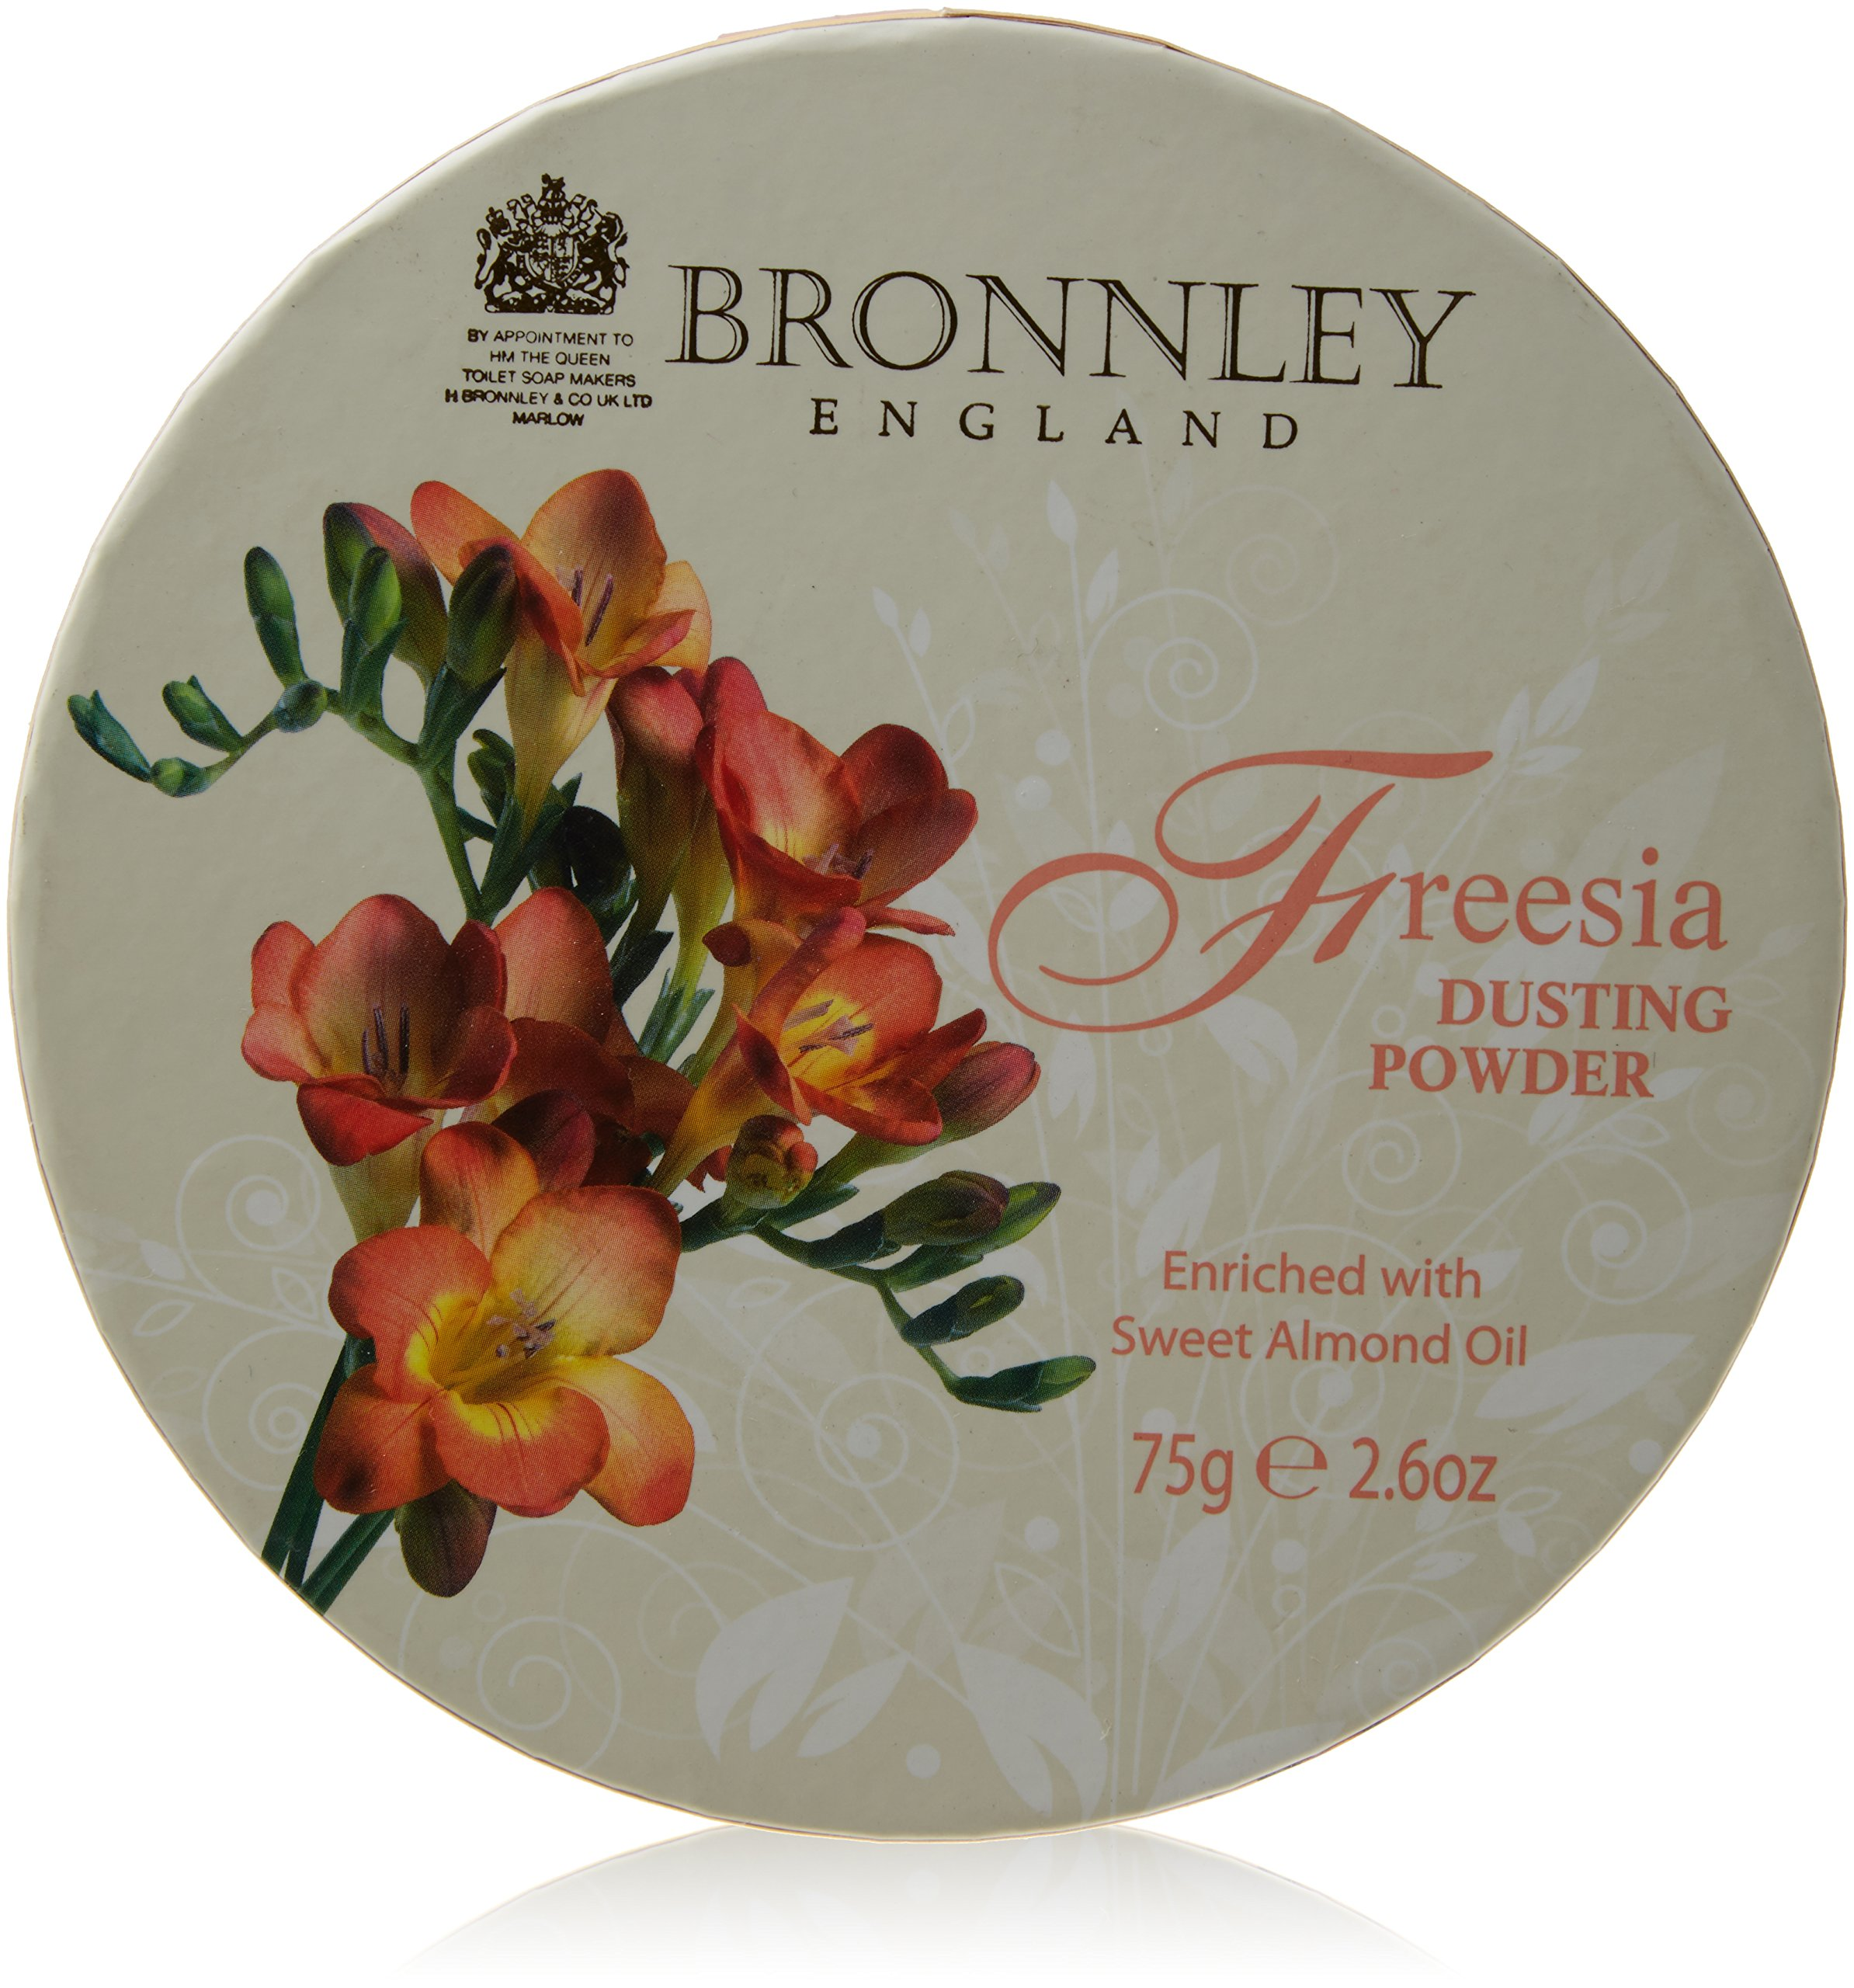 Bronnley Freesia 75g/2.6oz Dusting Powder